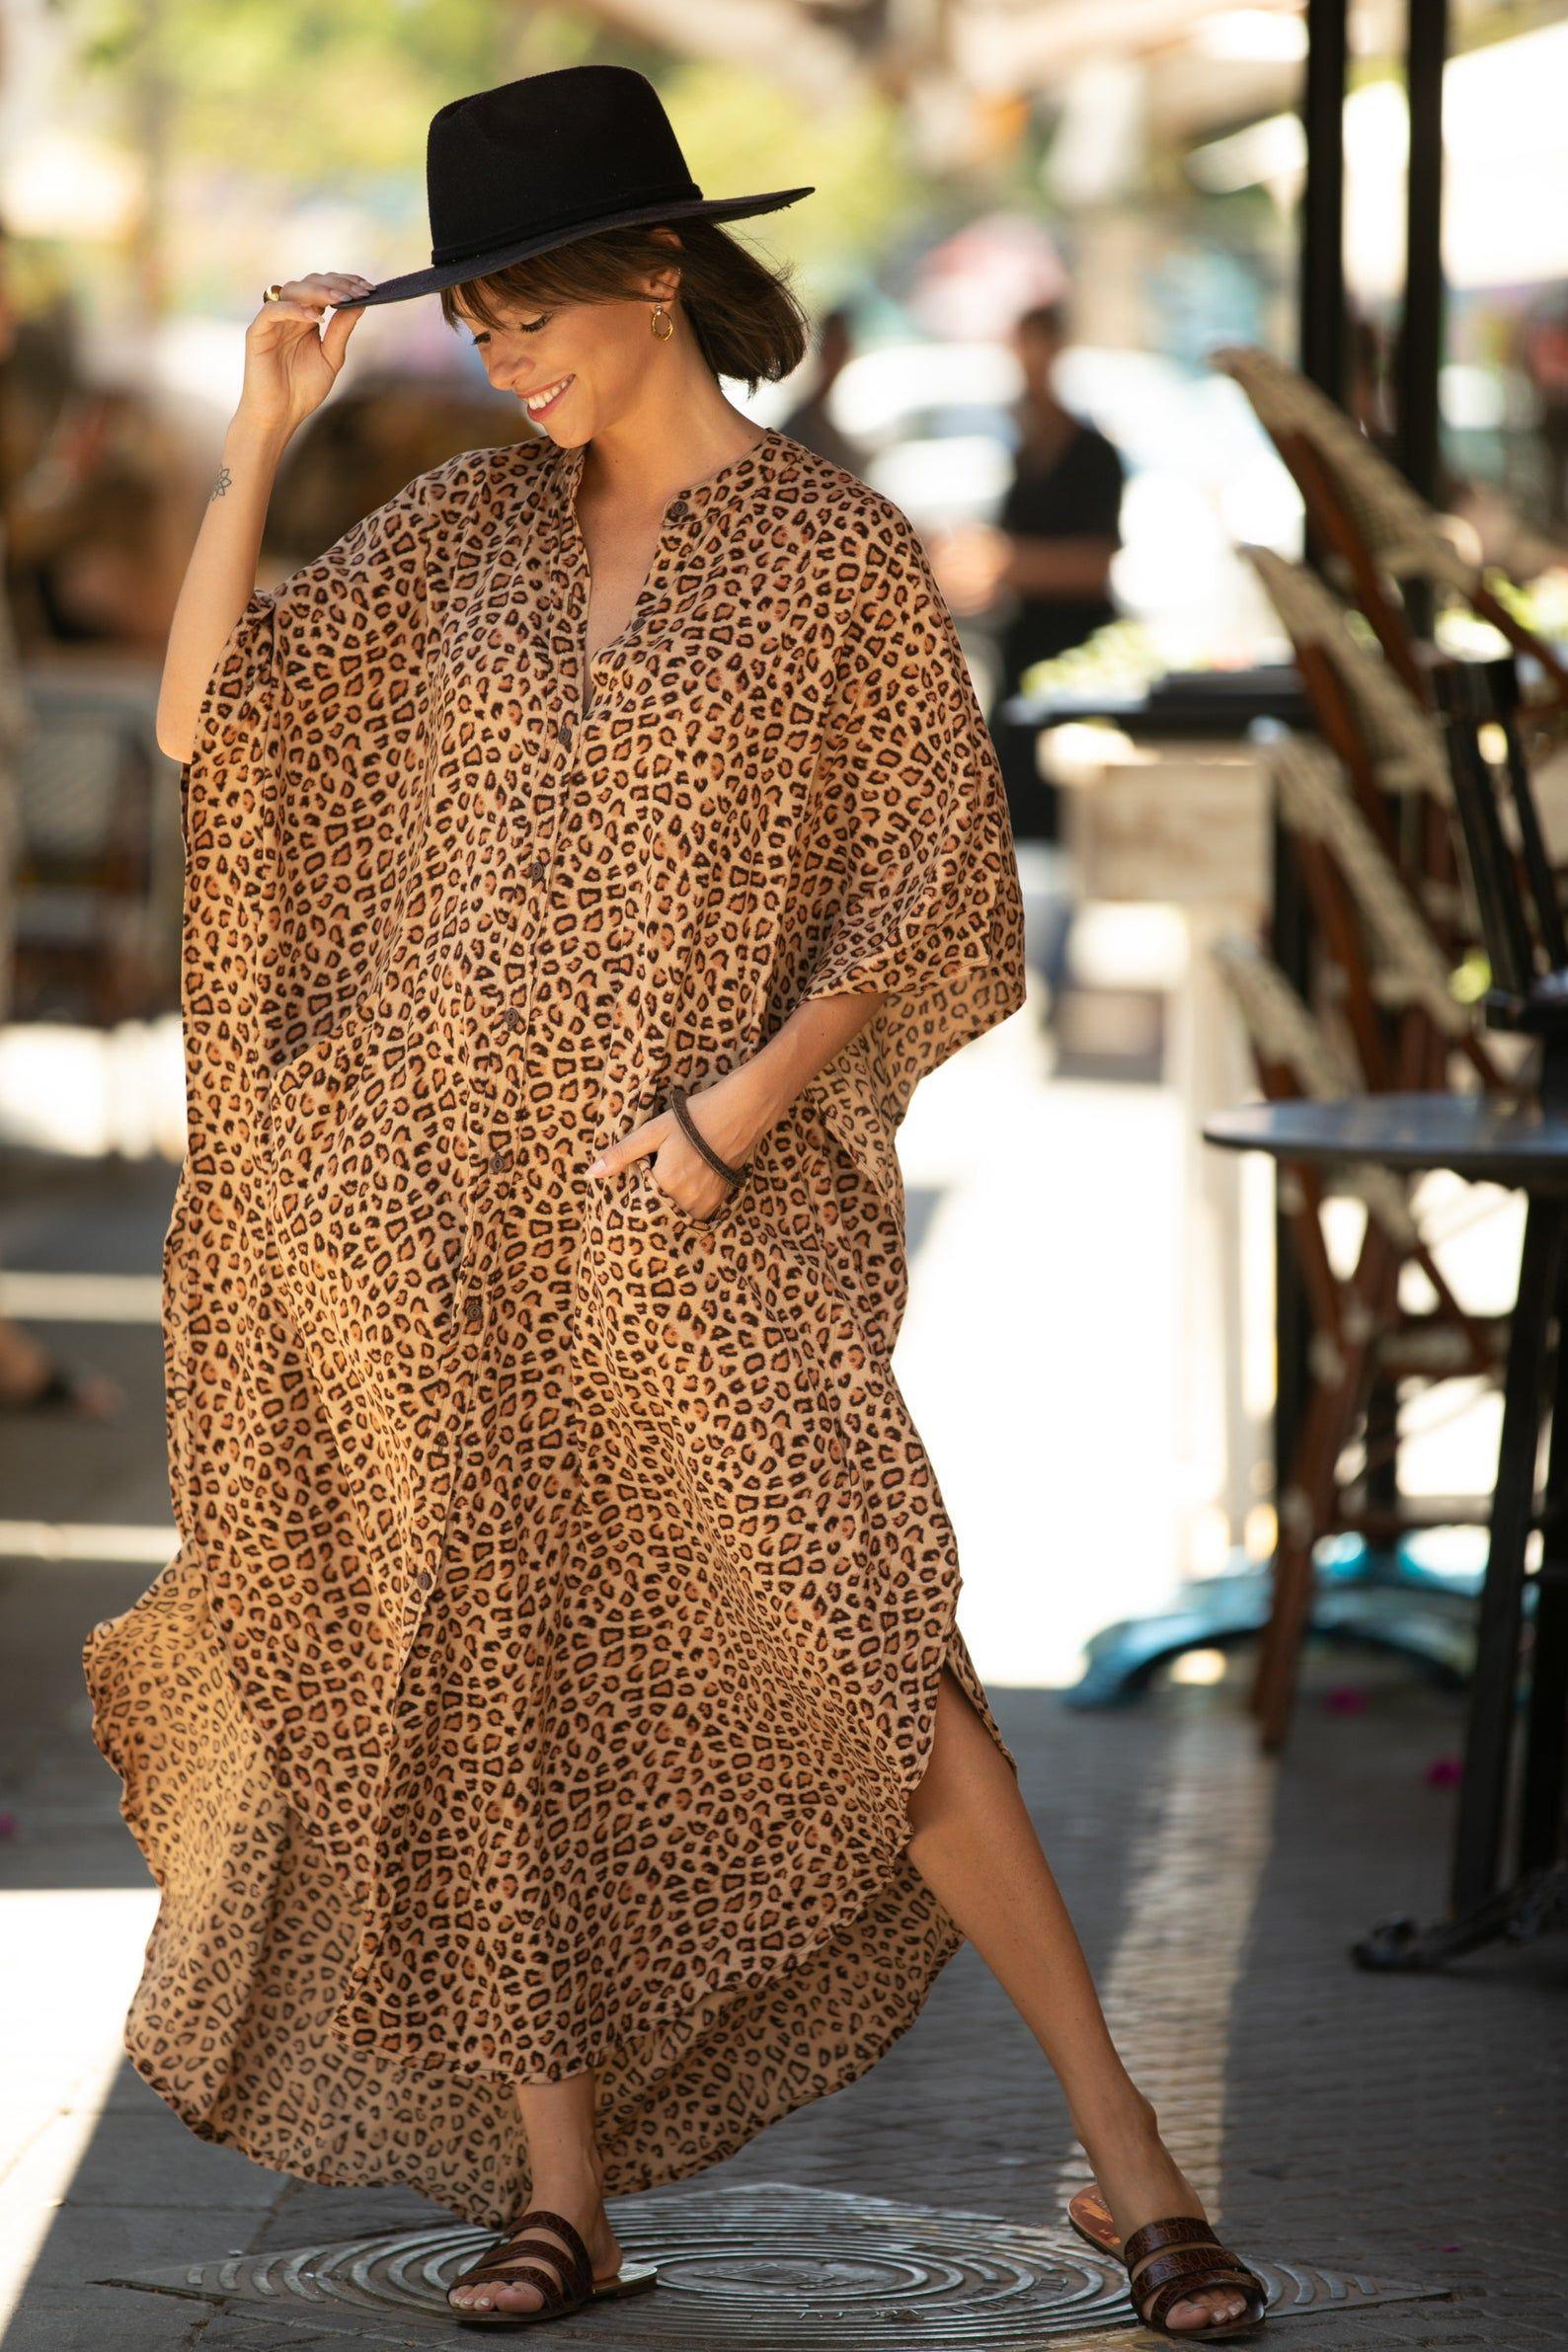 Leopard Print Oversize Kaftan Maxi Dress Boho Hipster Caftan Etsy Kaftan Maxi Dress Boho Maxi Dress Maxi Dress [ 2382 x 1588 Pixel ]